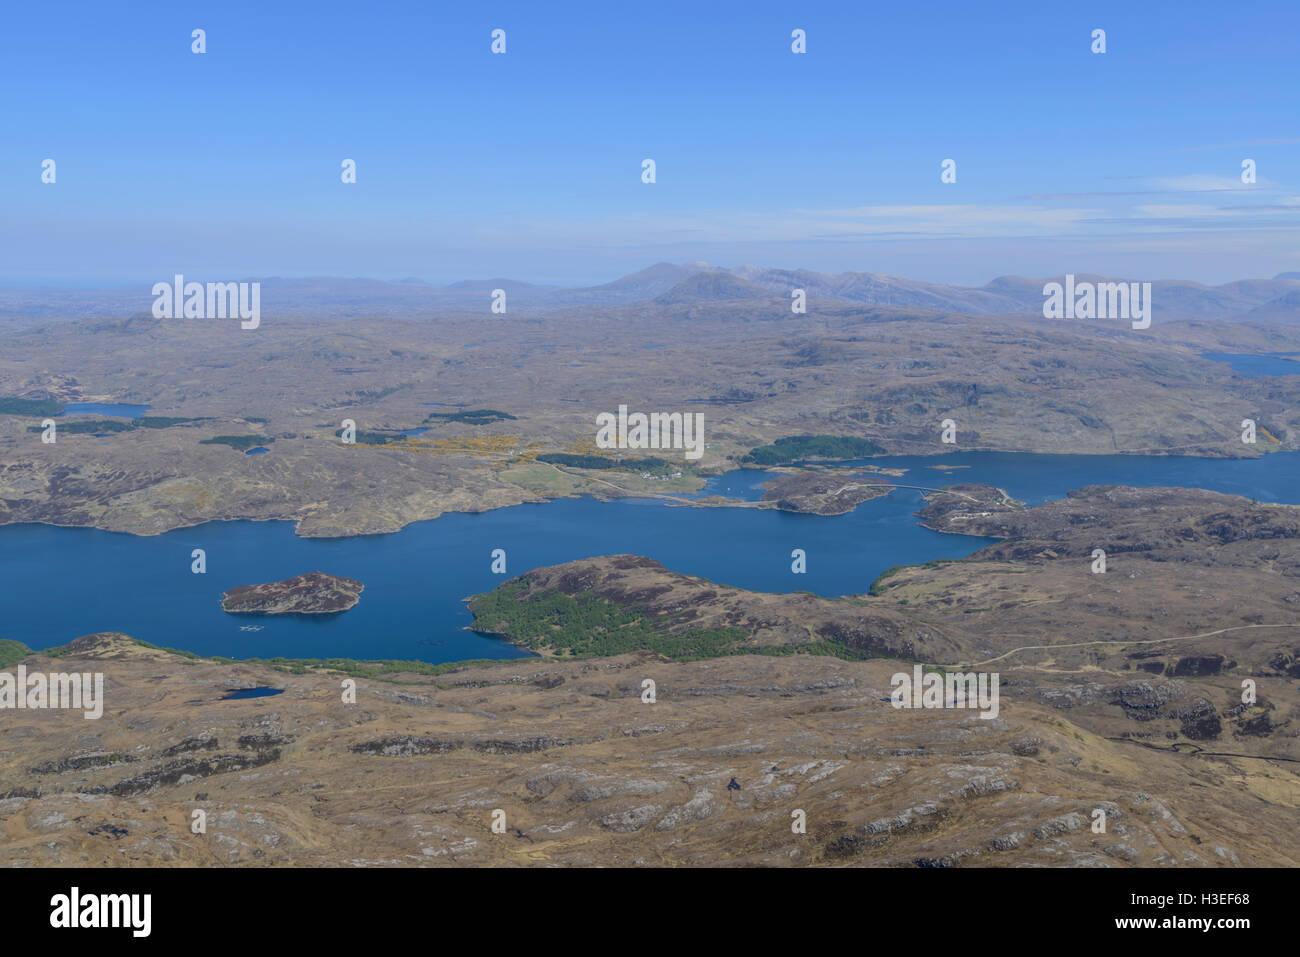 Laxford Bridge, Loch a' Chairn Bhain and Kylesku from Sail Ghorm (Corbett), Quinag, Assynt, Sutherland, Scotland. - Stock Image